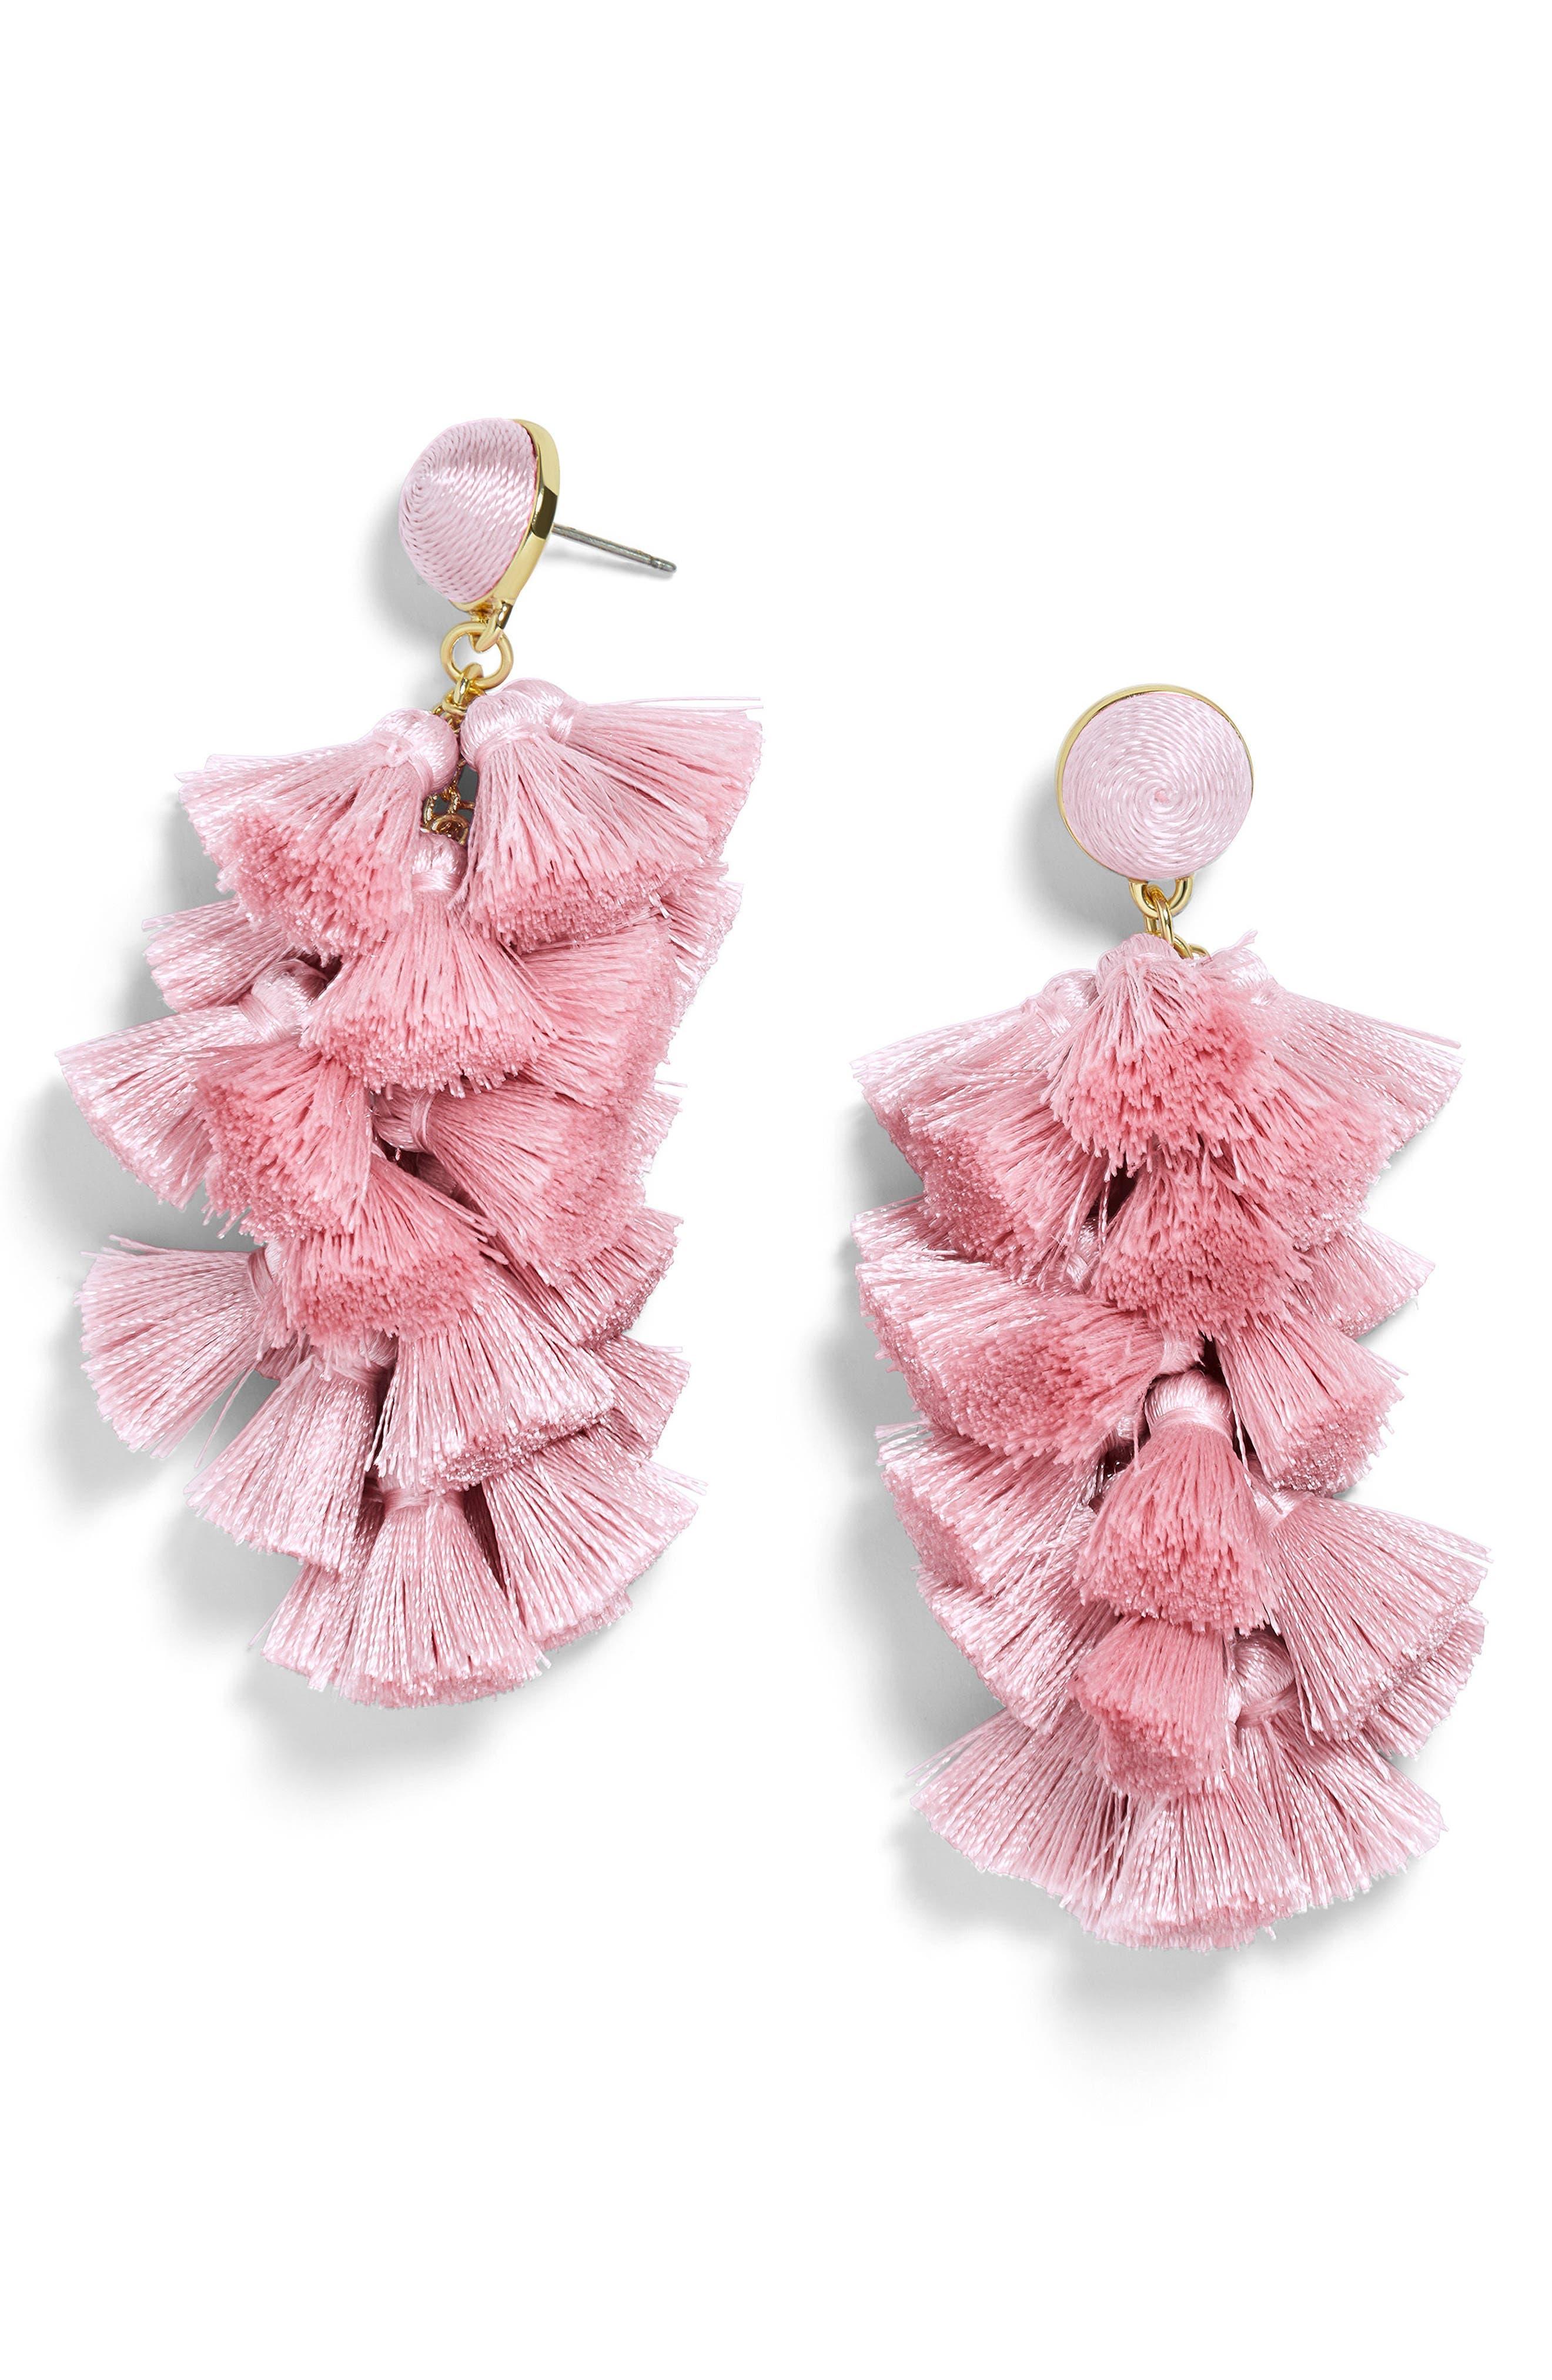 Contessa Tassel Earrings,                         Main,                         color, Blush